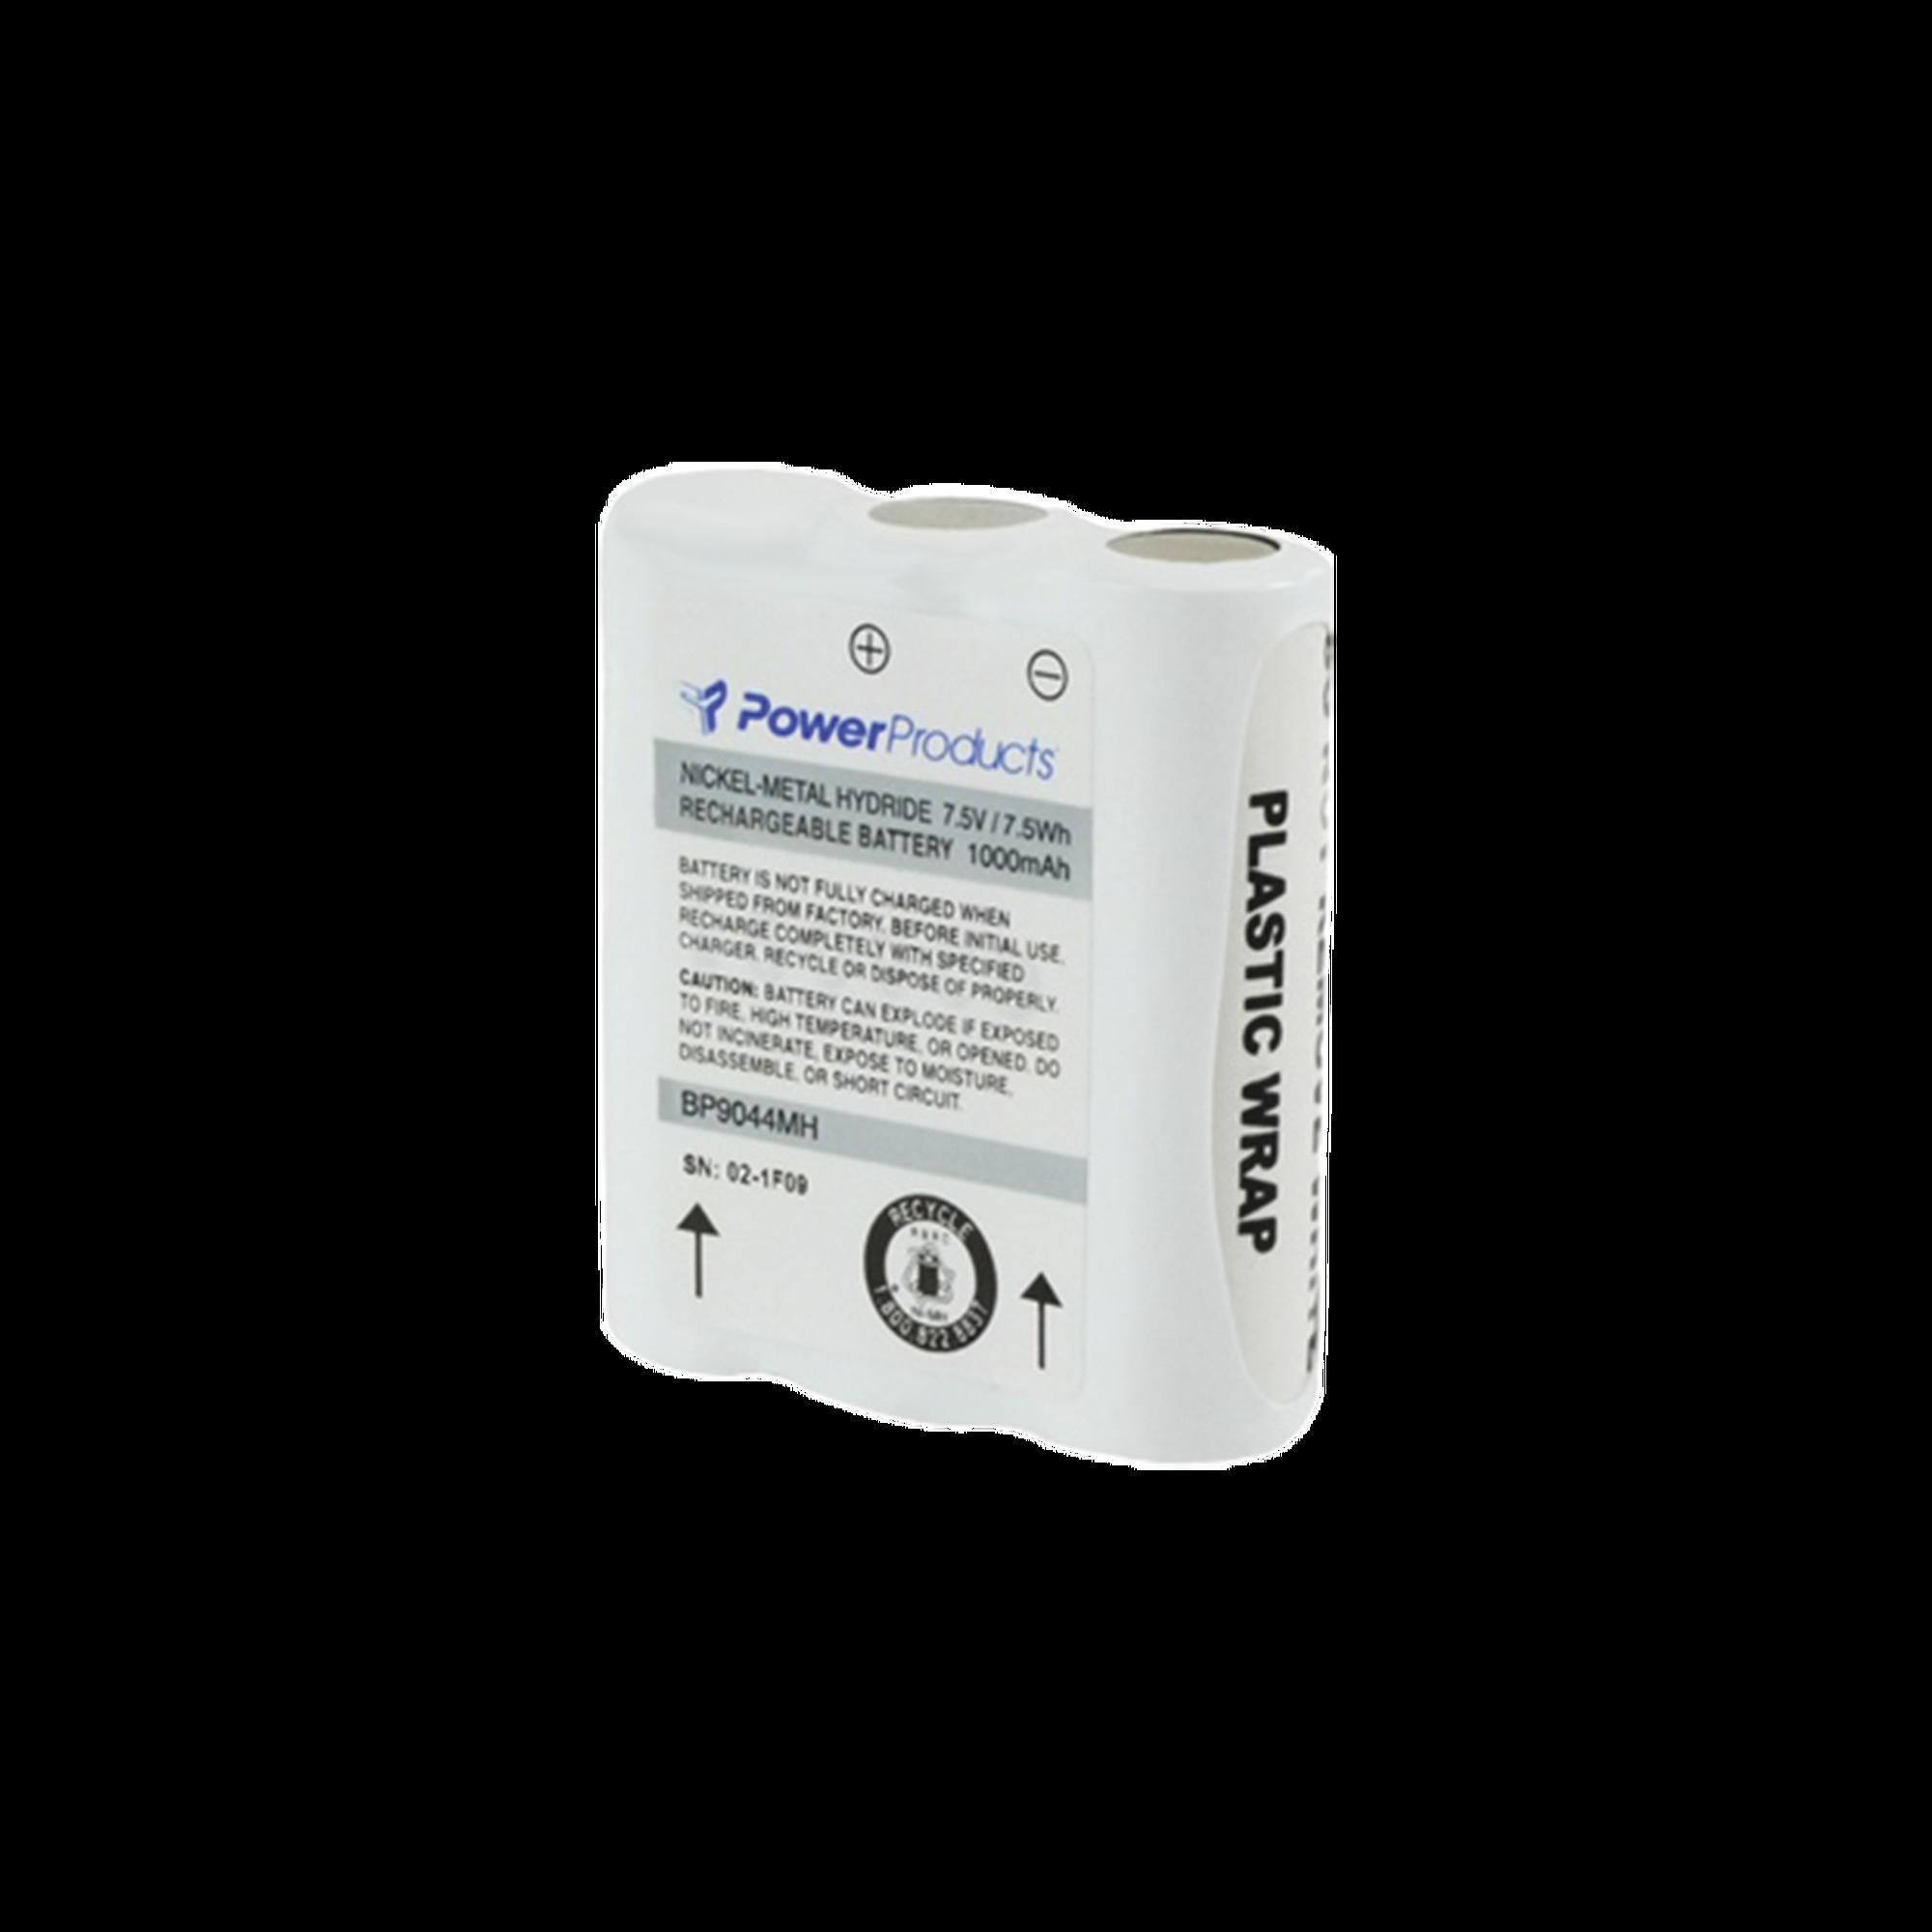 Batería de Ni-MH, 1000 mAh 7.5 V para radios Motorola SP10, SP50, P10, P50+, HT10, SPIRIT M SERIES